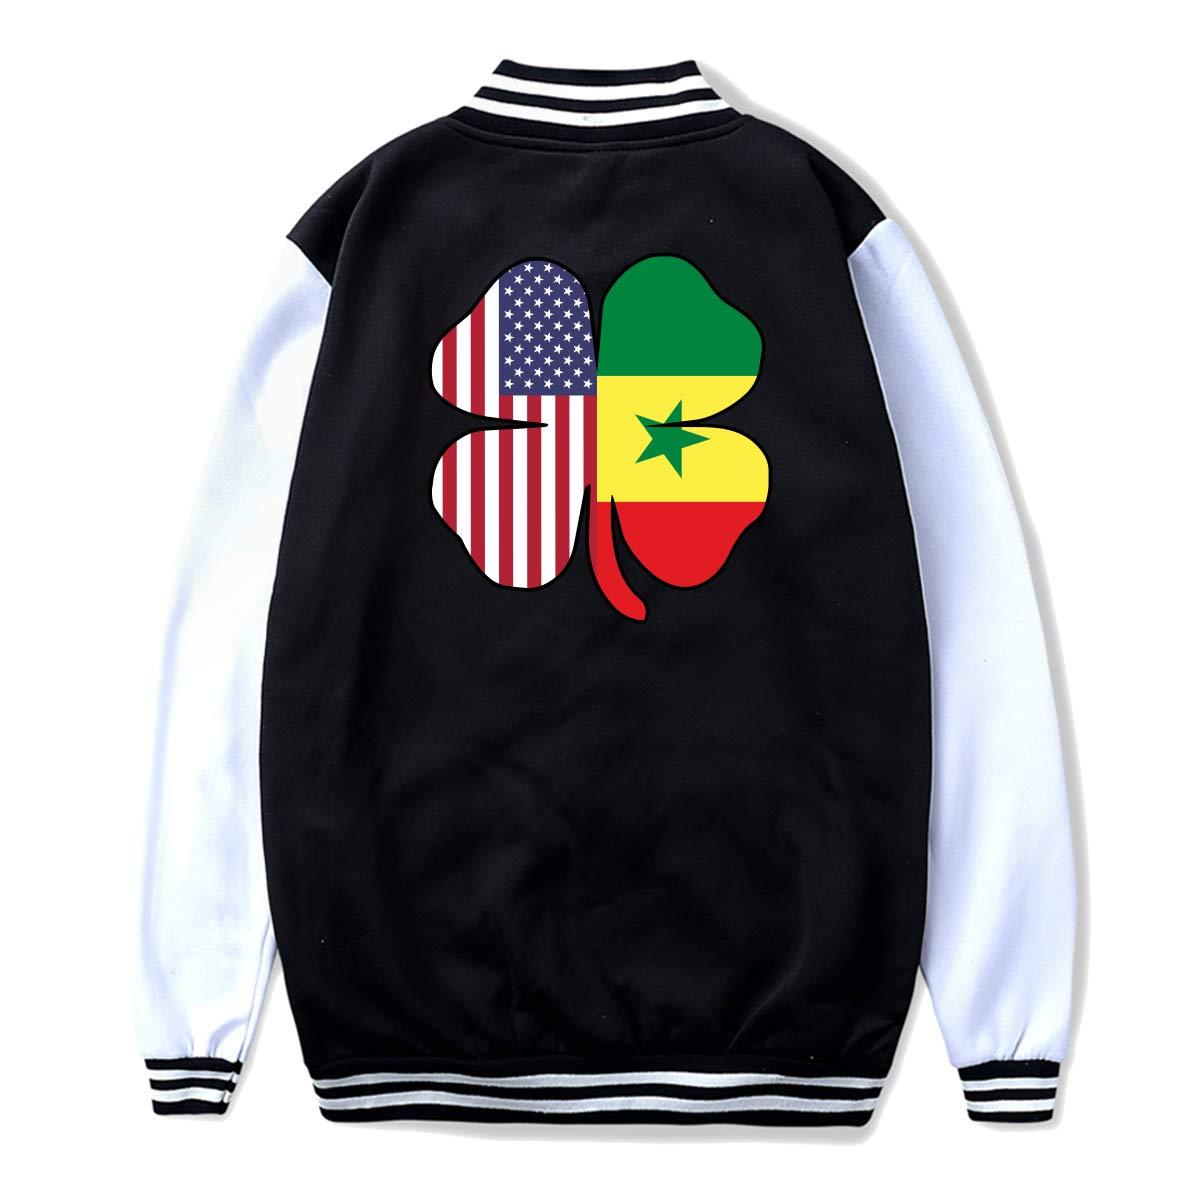 NJKM5MJ Unisex Teen Baseball Uniform Jacket American Senegal Flag Shamrock Coat Sport Outfit Back Print